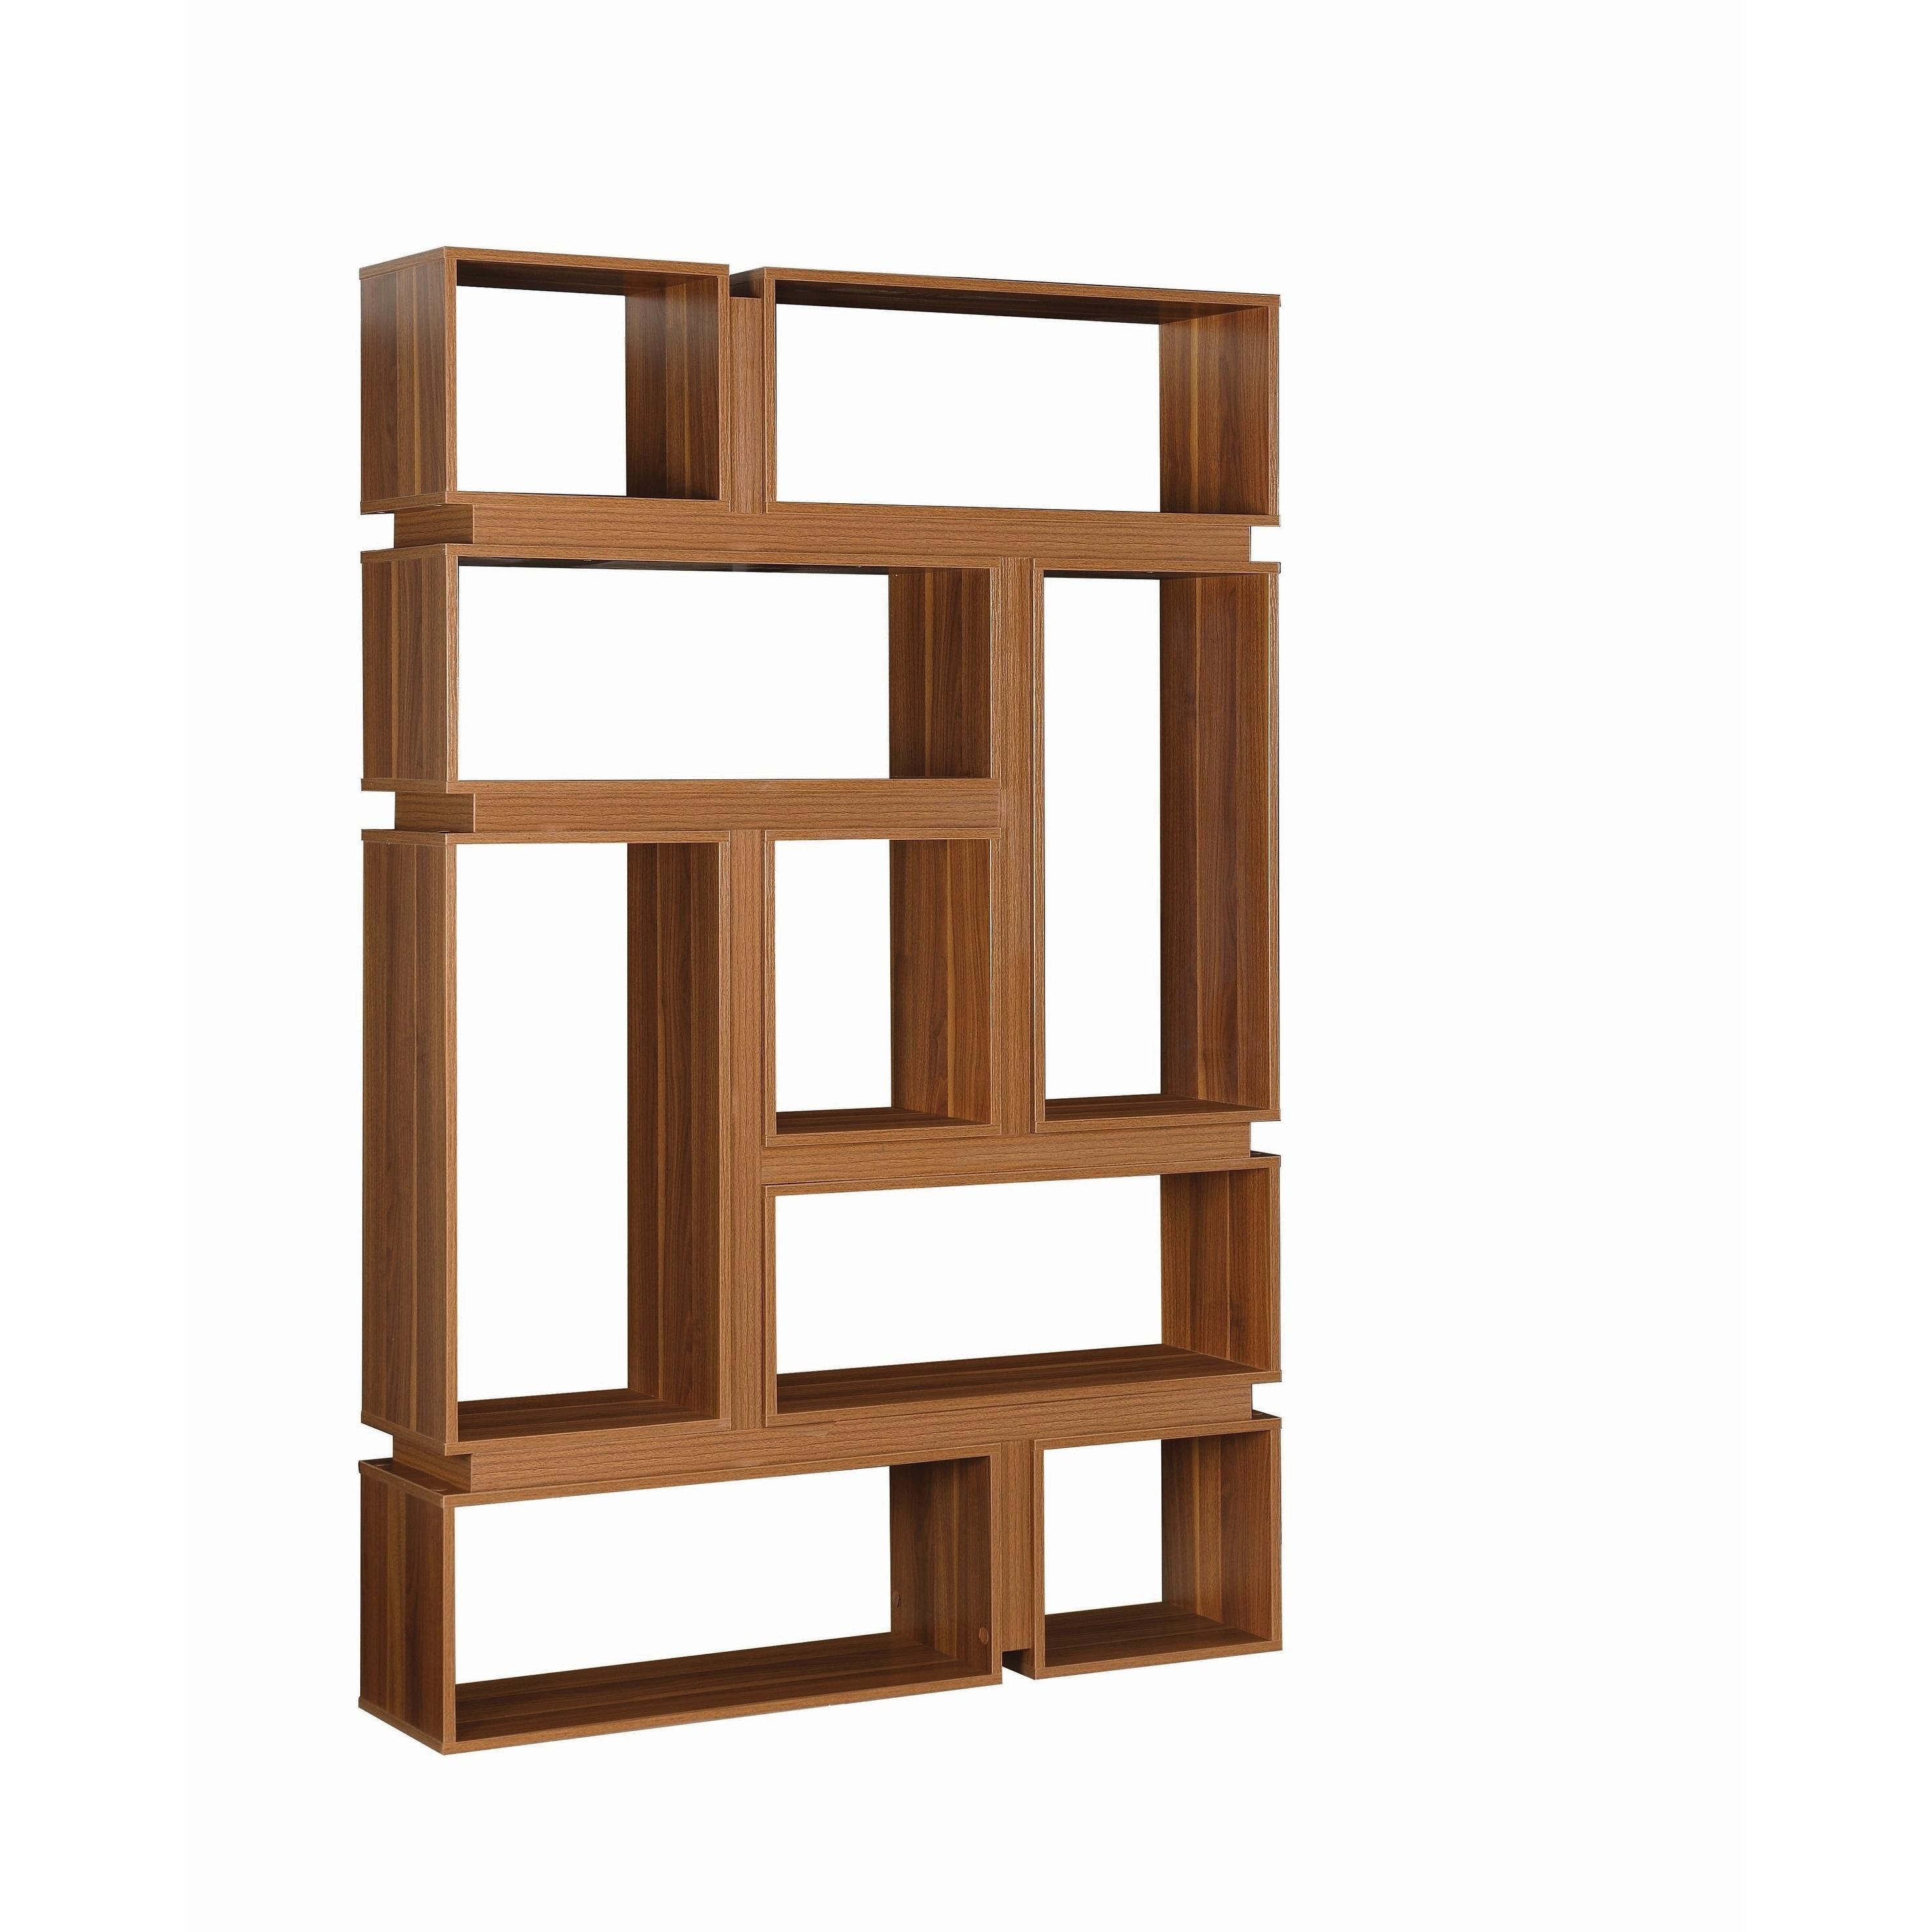 Modern Light Walnut 9 Shelf Geometric Bookcase Free Shipping Today 26785269